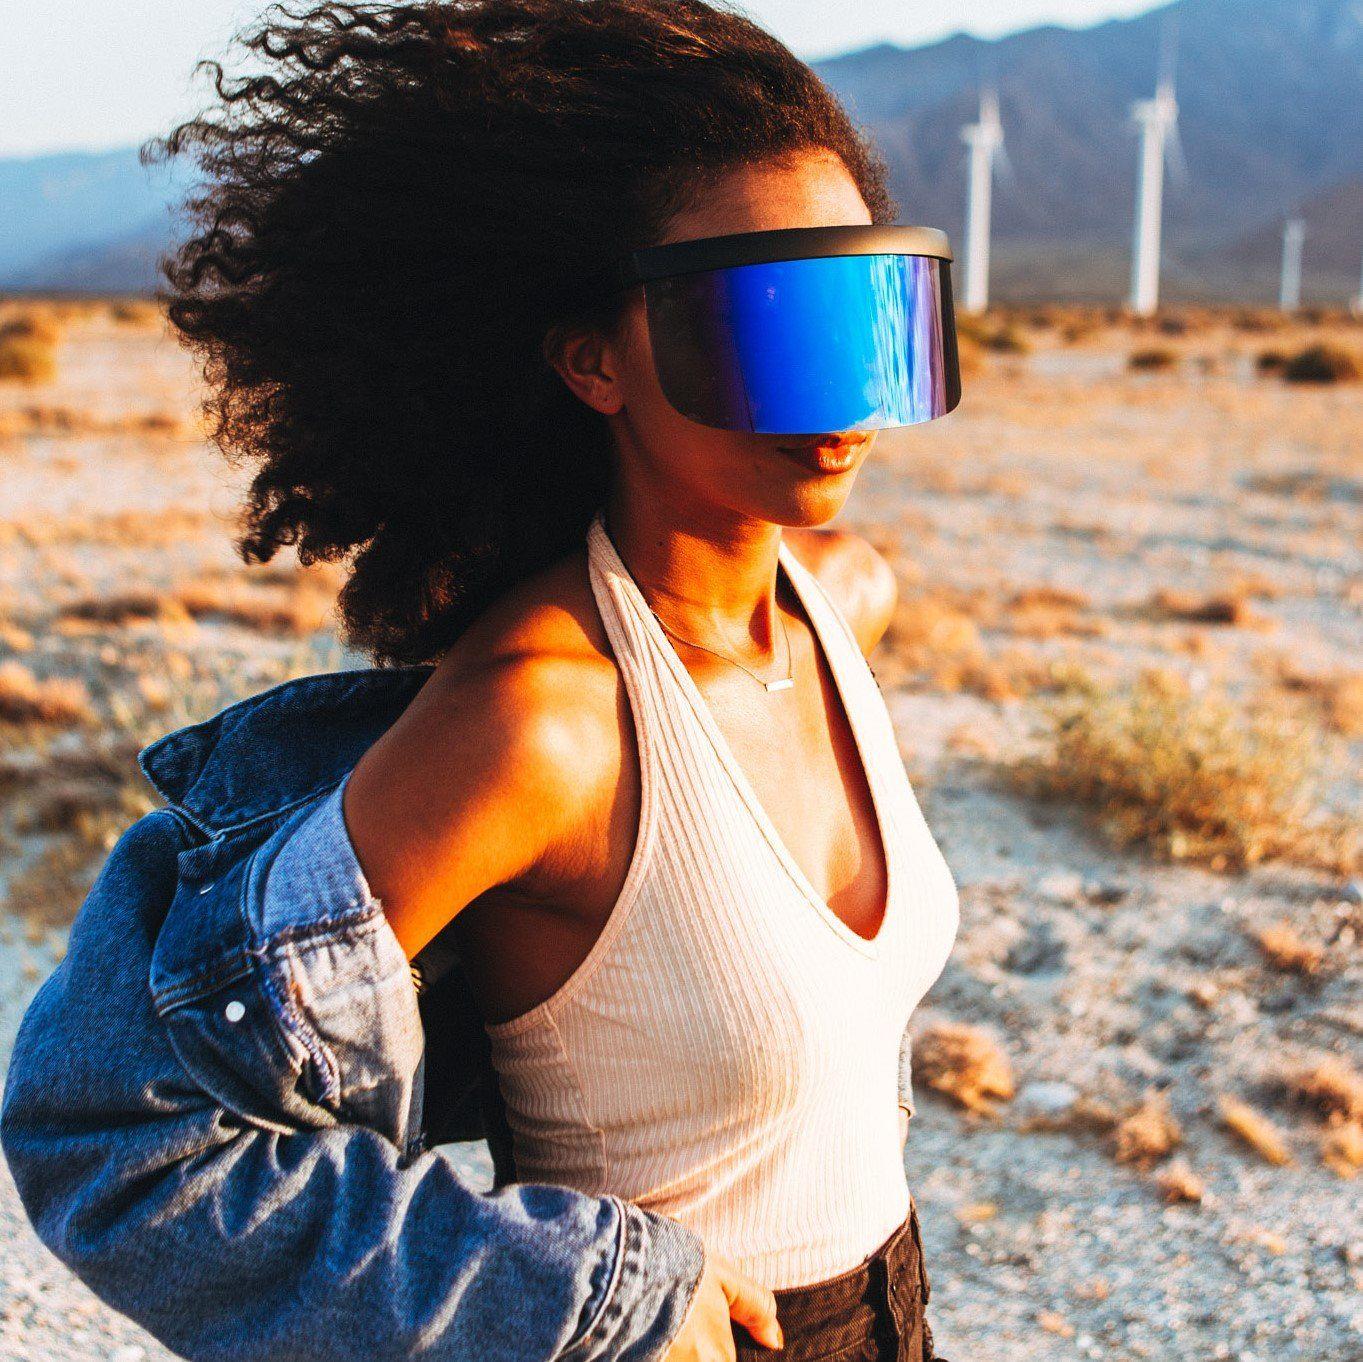 5401a8632098 Oversized full shield visor sunglasses in 2019 | Chic | Sunglasses ...